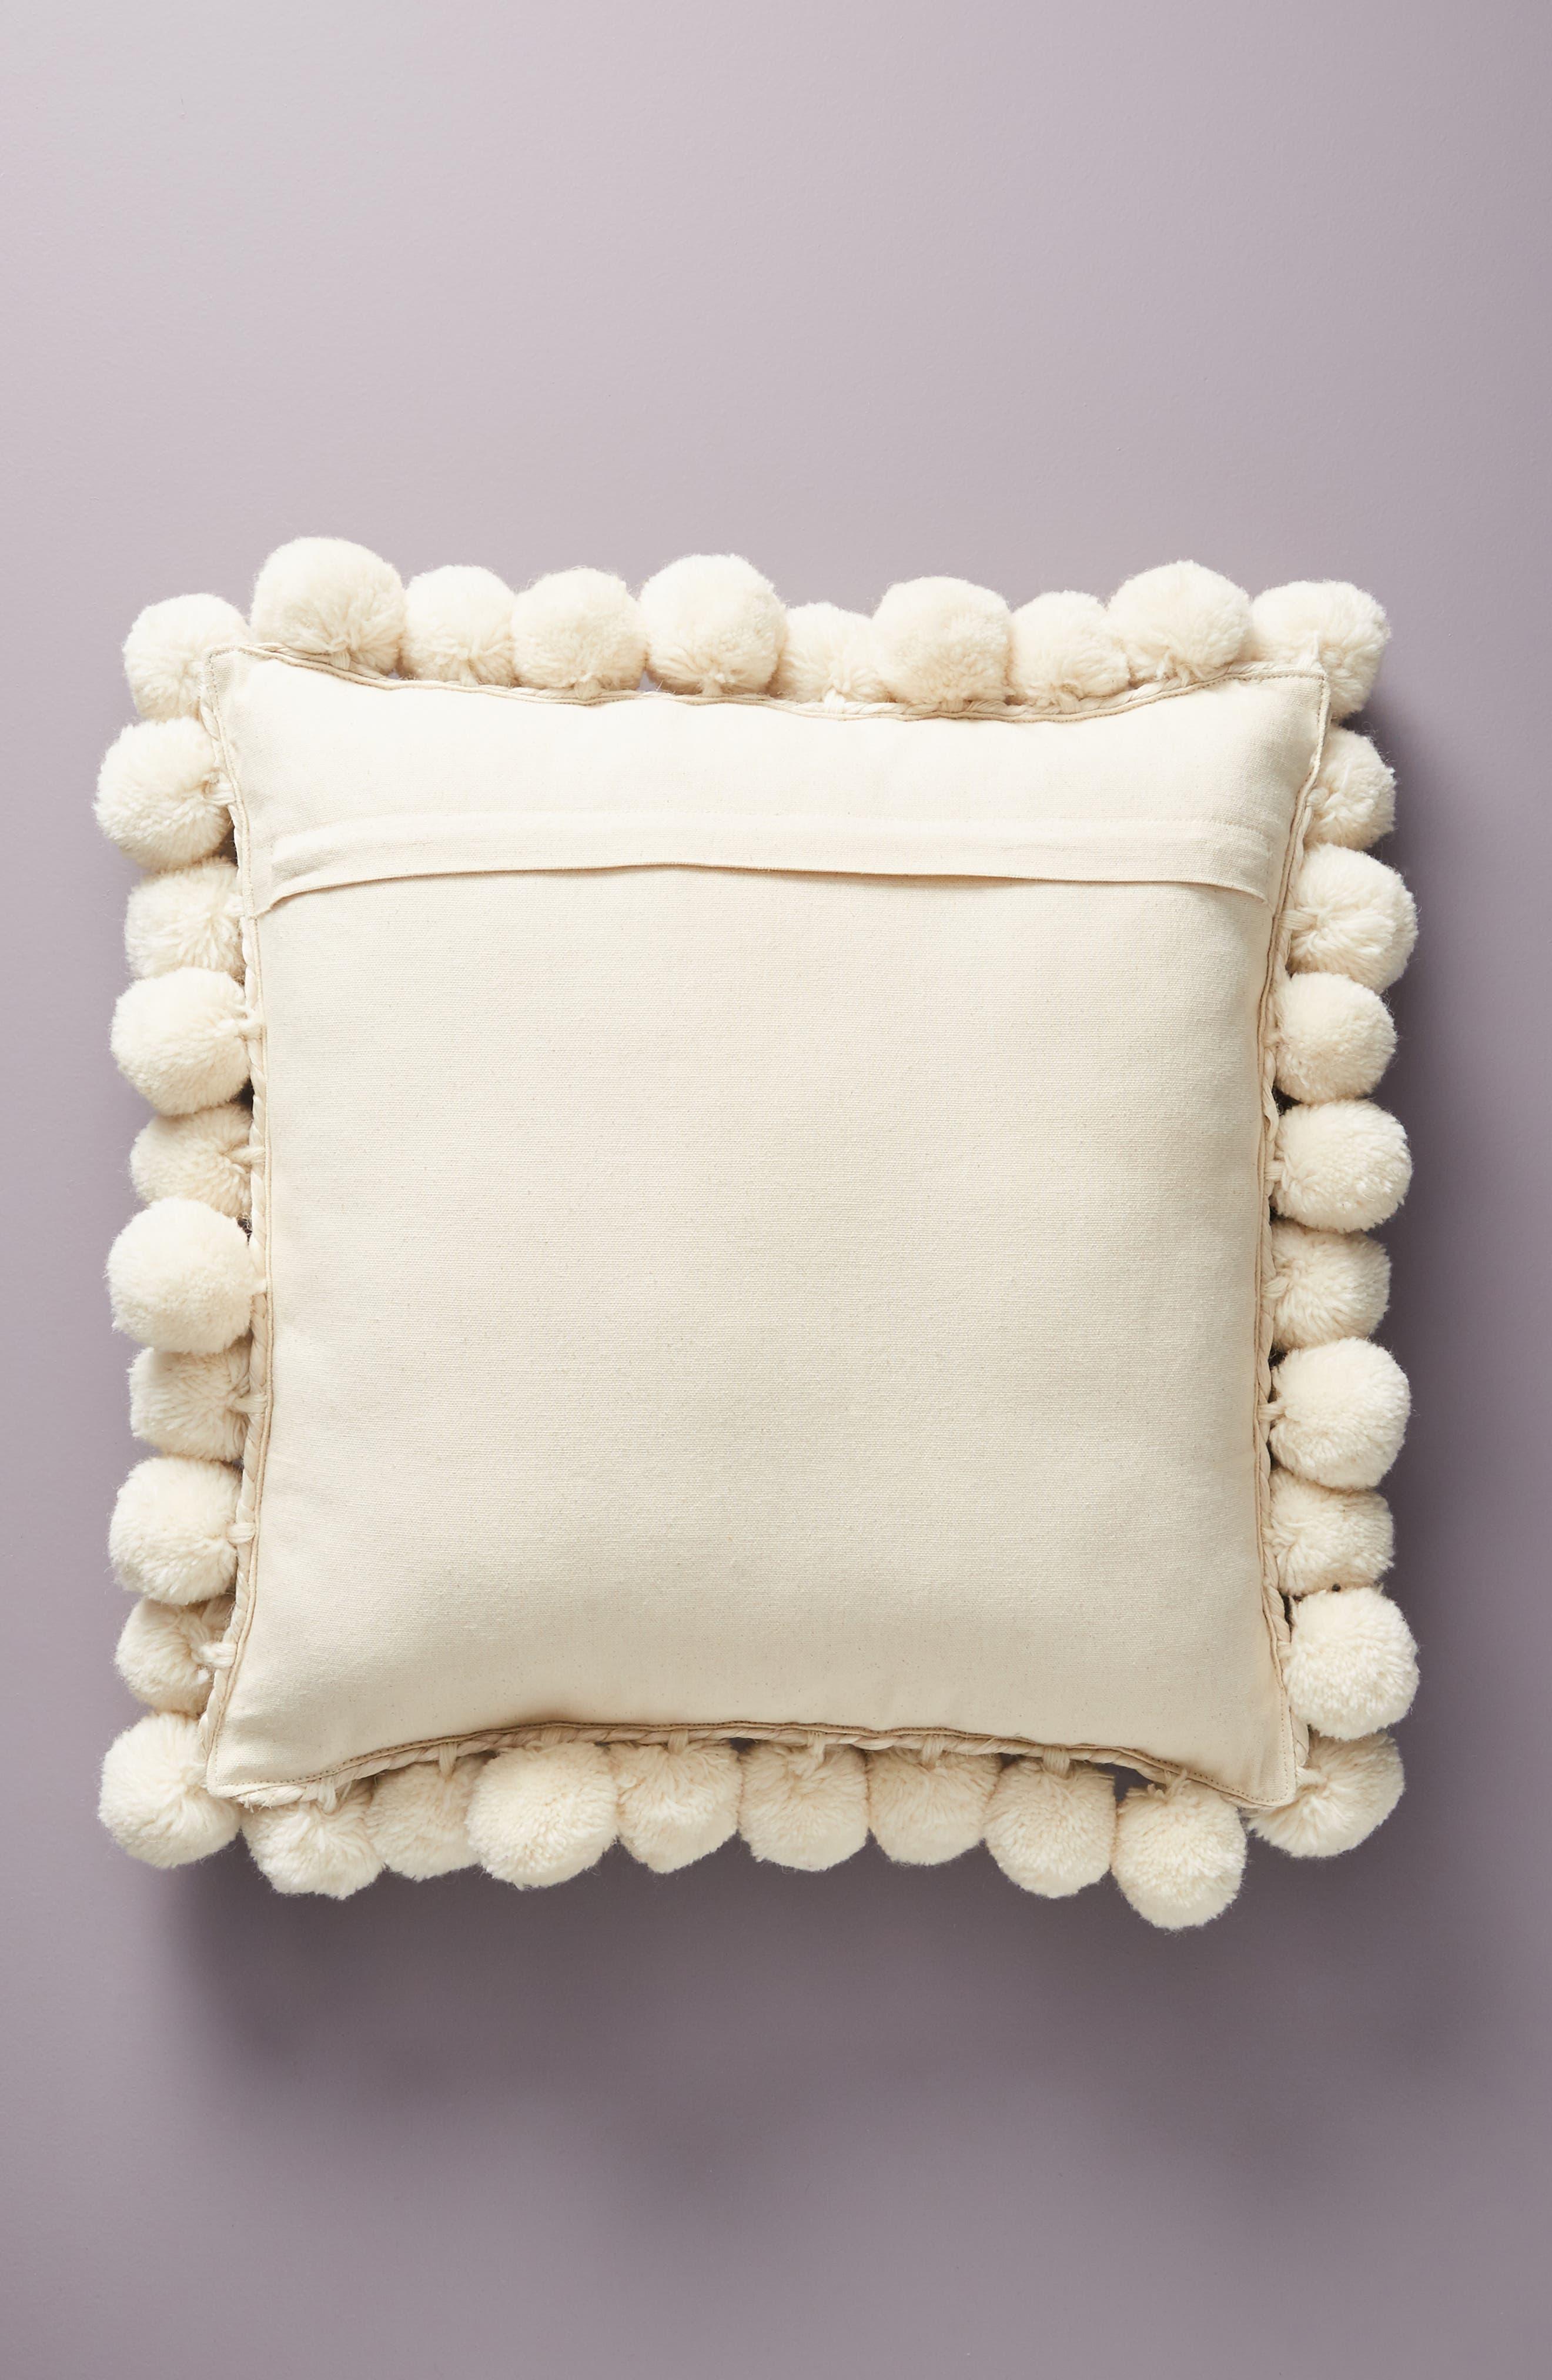 Pompom Jute Accent Pillow,                             Alternate thumbnail 2, color,                             IVORY